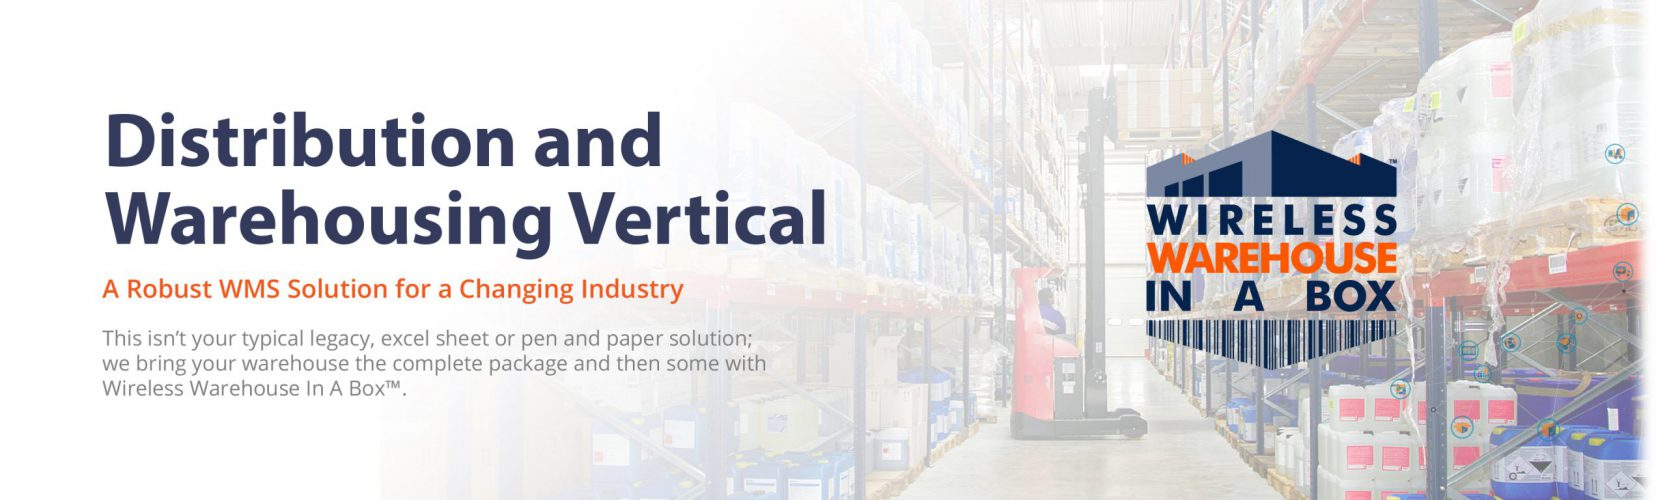 Distribution_Warehousing_Header_Content